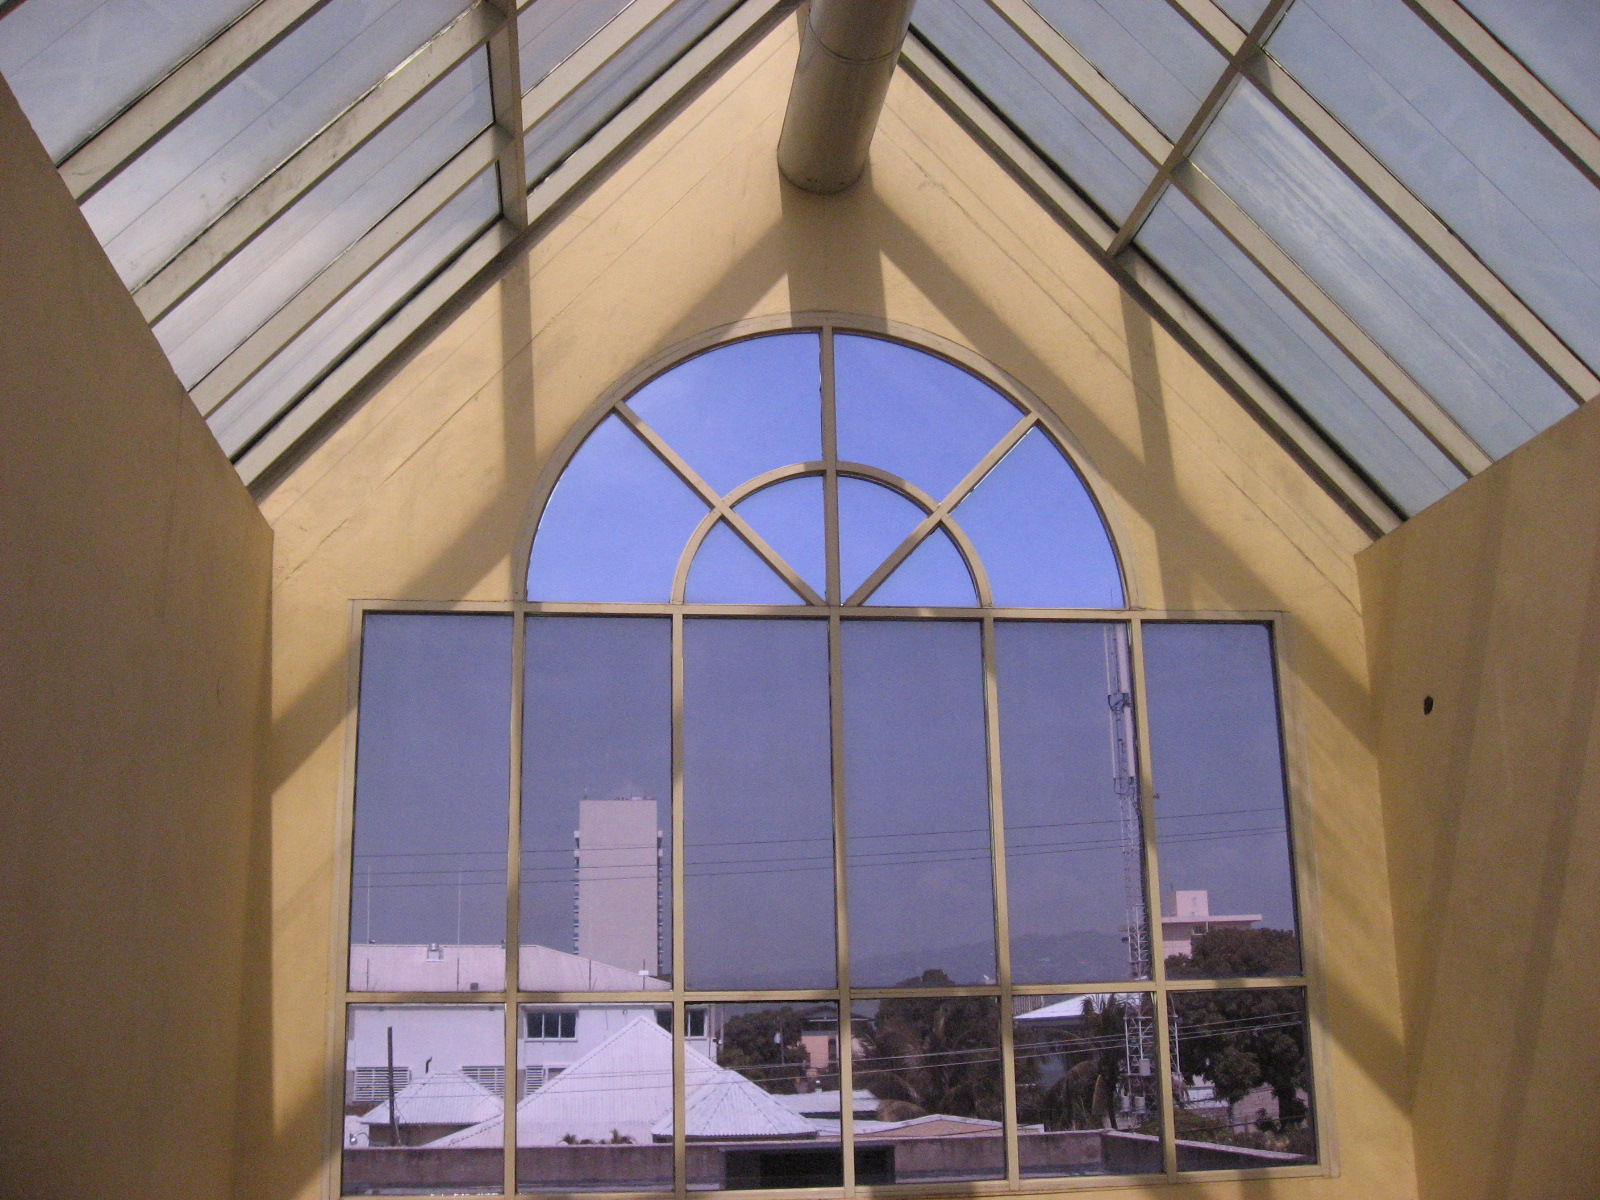 Swell Dhl Designer Builders 2 Belmont Road Kingston Jamaica Home Remodeling Inspirations Genioncuboardxyz